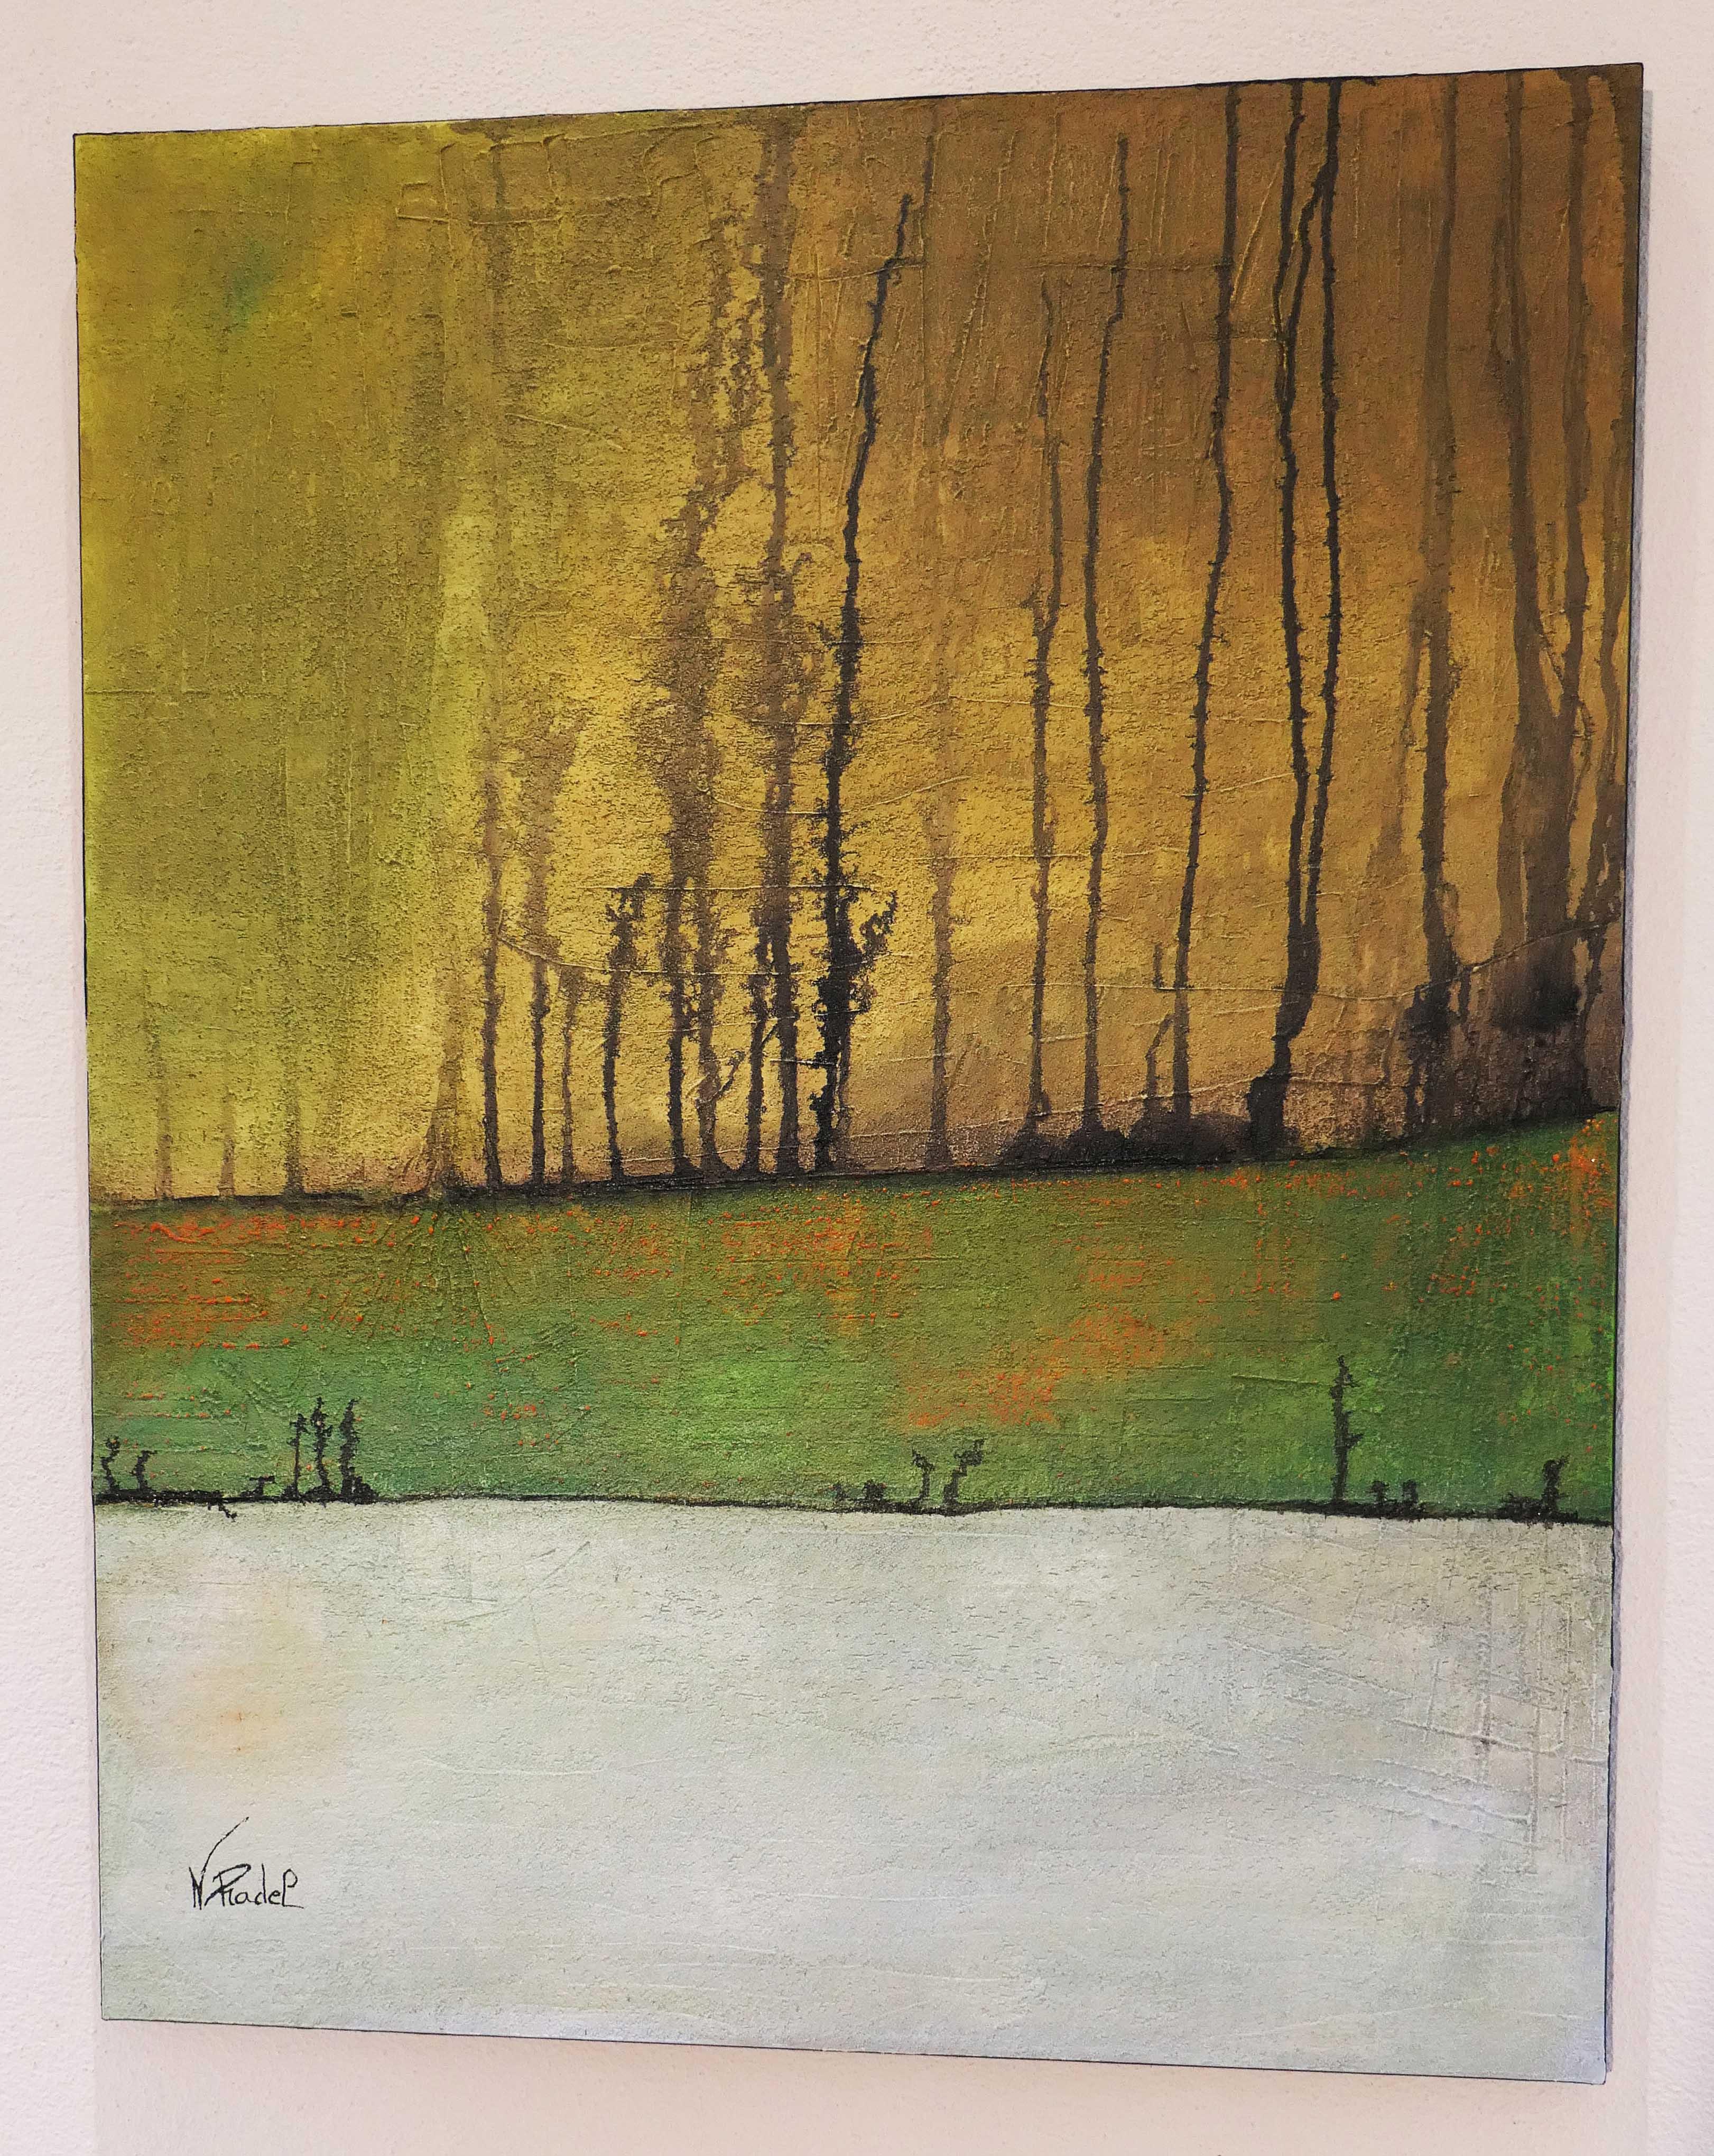 Solstice d'hiver, toile 92 x 73 cm (1)